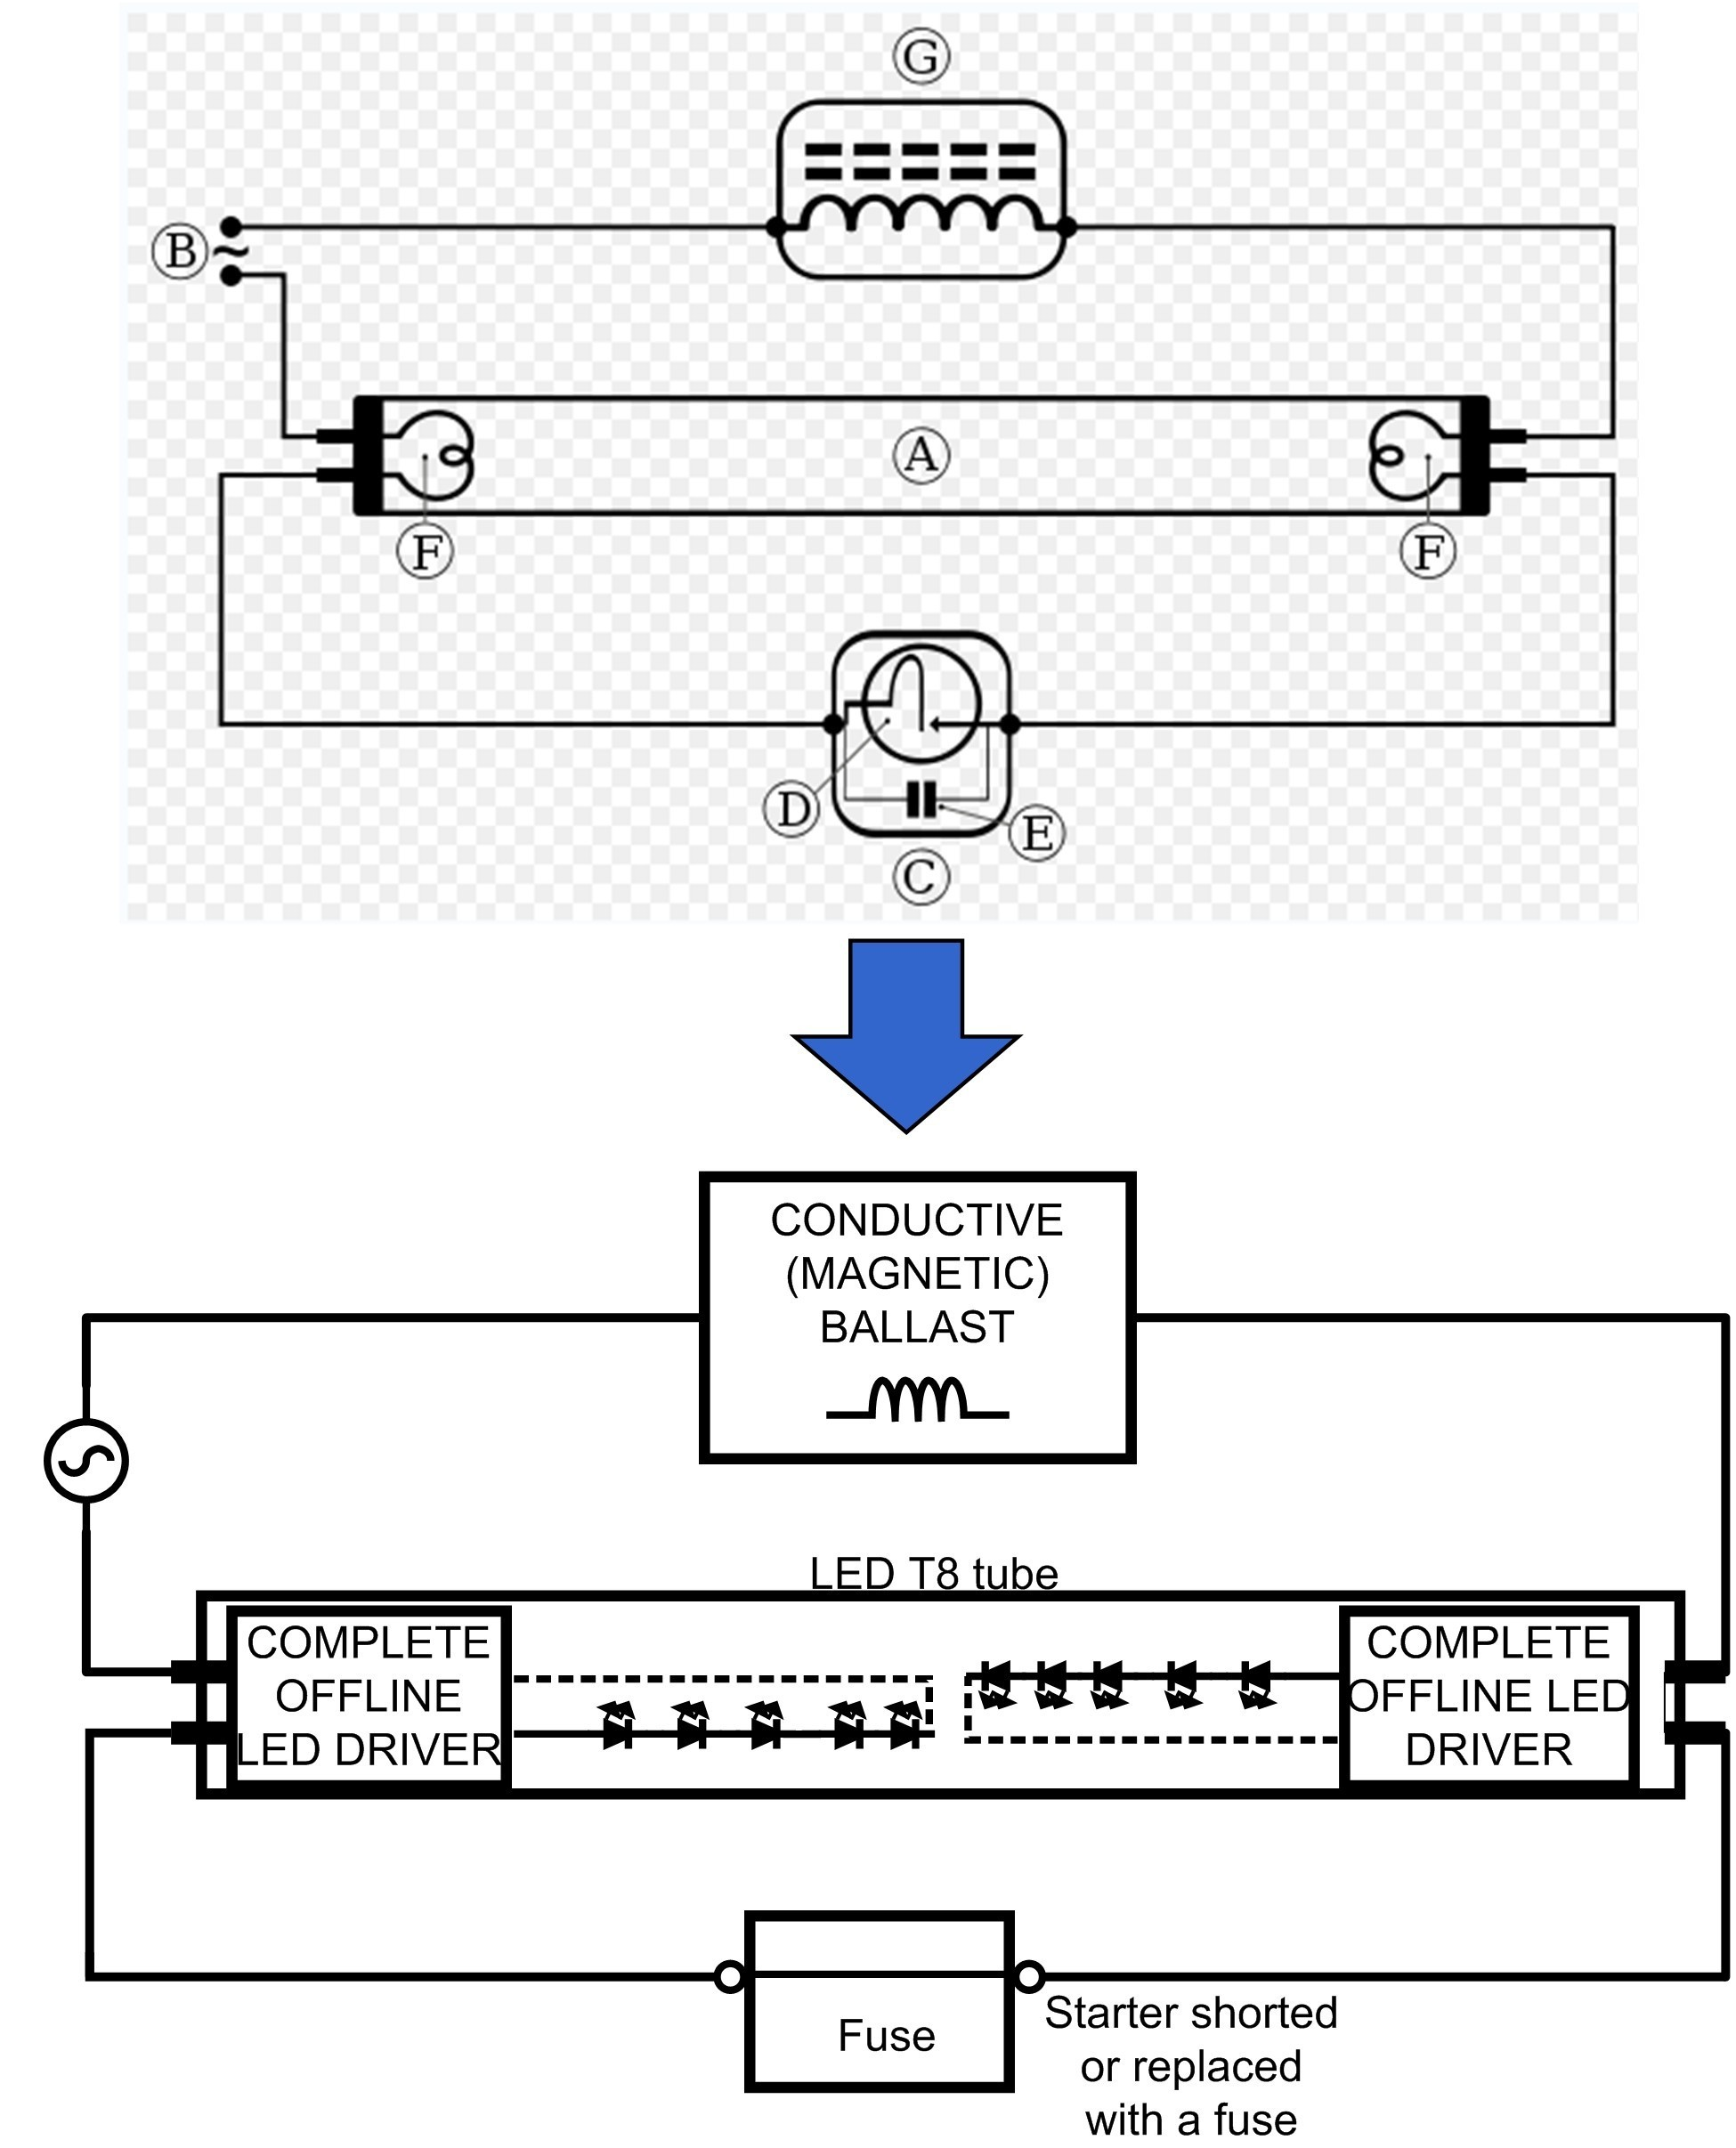 T8 Ballast Wiring Diagram Elegant Convert Fluorescent to Led Wiring Diagram Diagram Of T8 Ballast Wiring Diagram